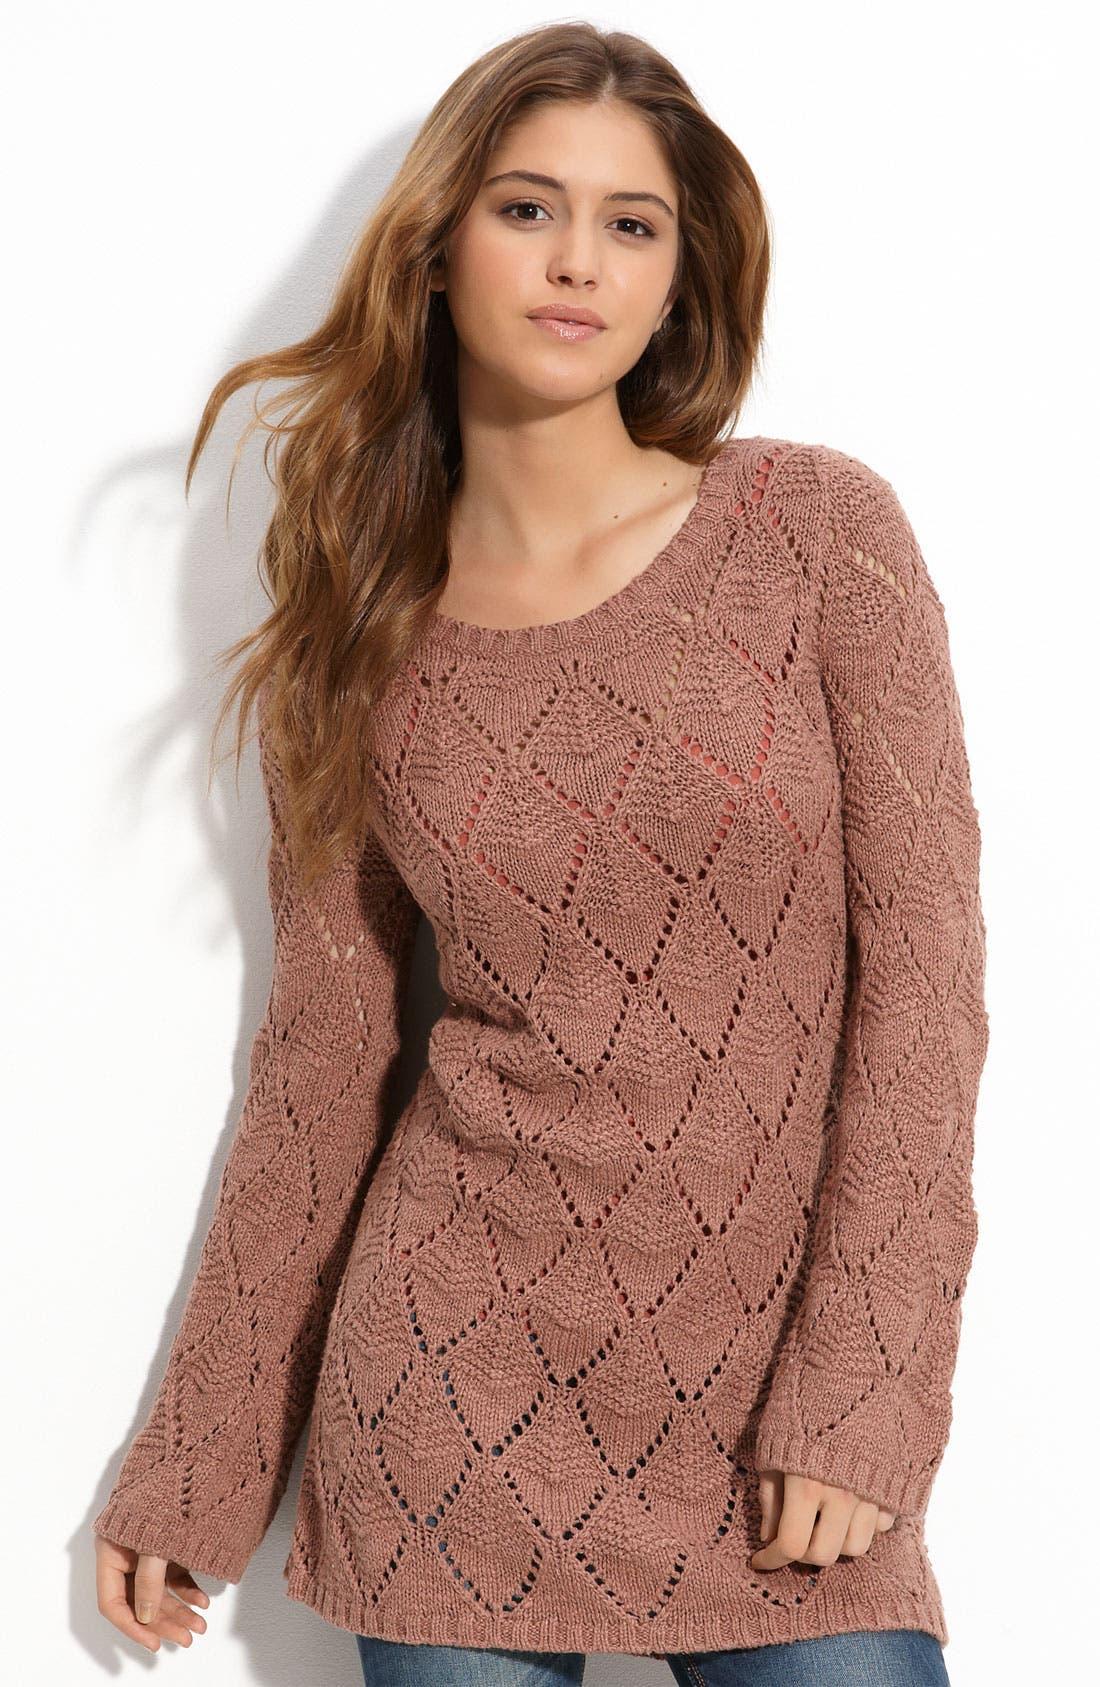 Alternate Image 1 Selected - Frenchi® Pointelle Tunic Sweater (Juniors)